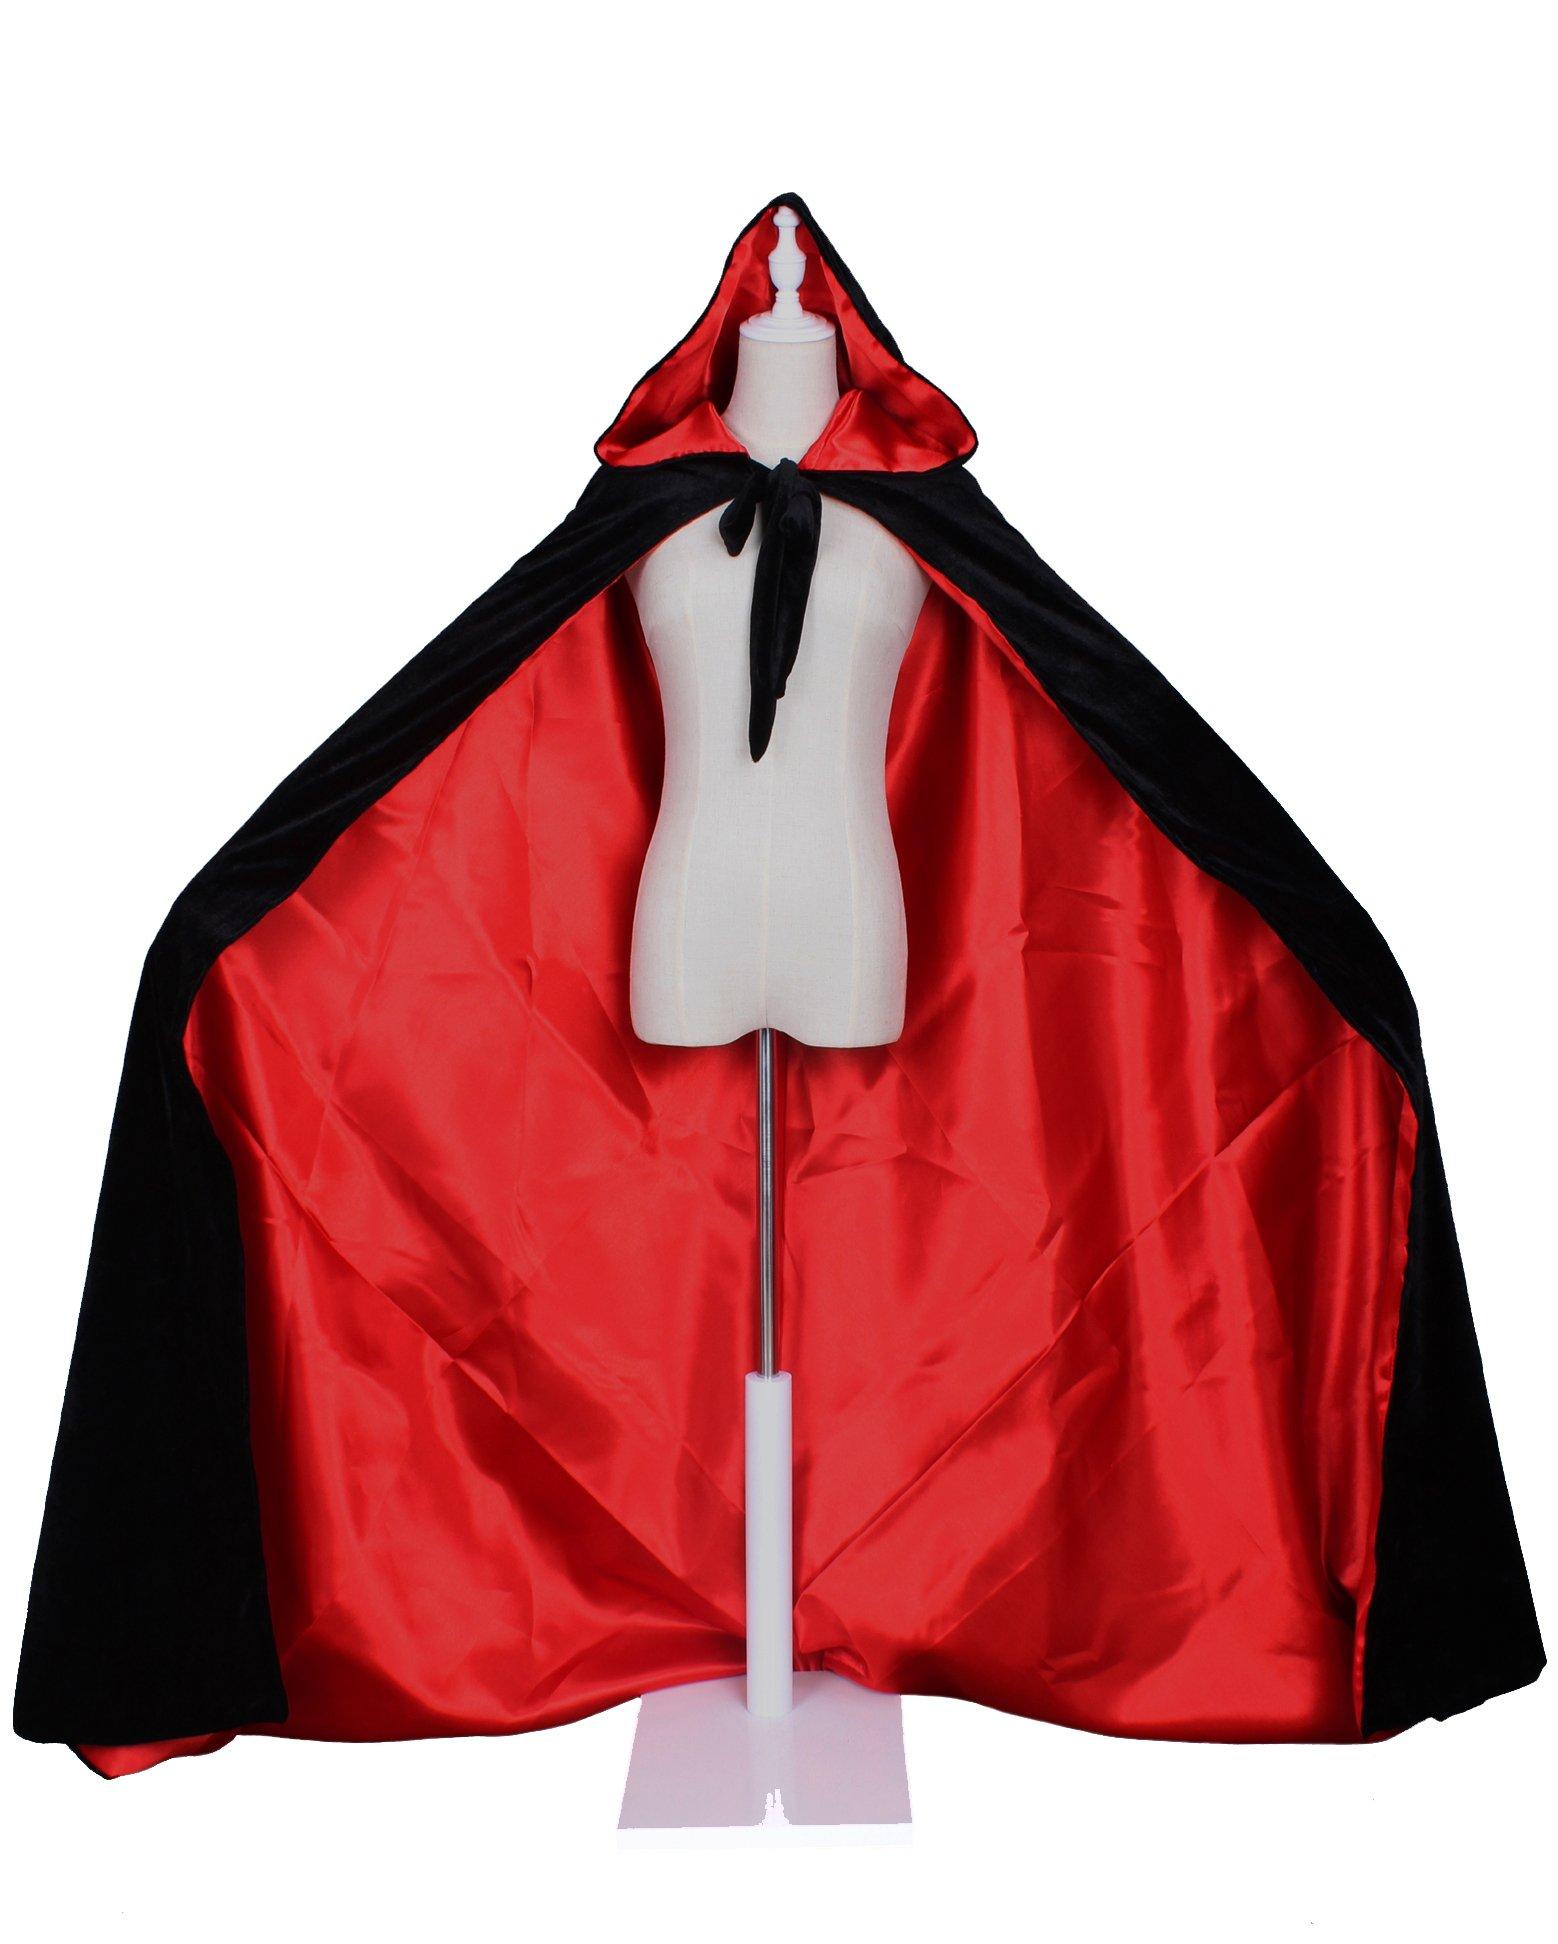 LuckyMjmy Velvet Renaissance Medieval Cloak Cape lined with Satin (Medium, Black-Red)